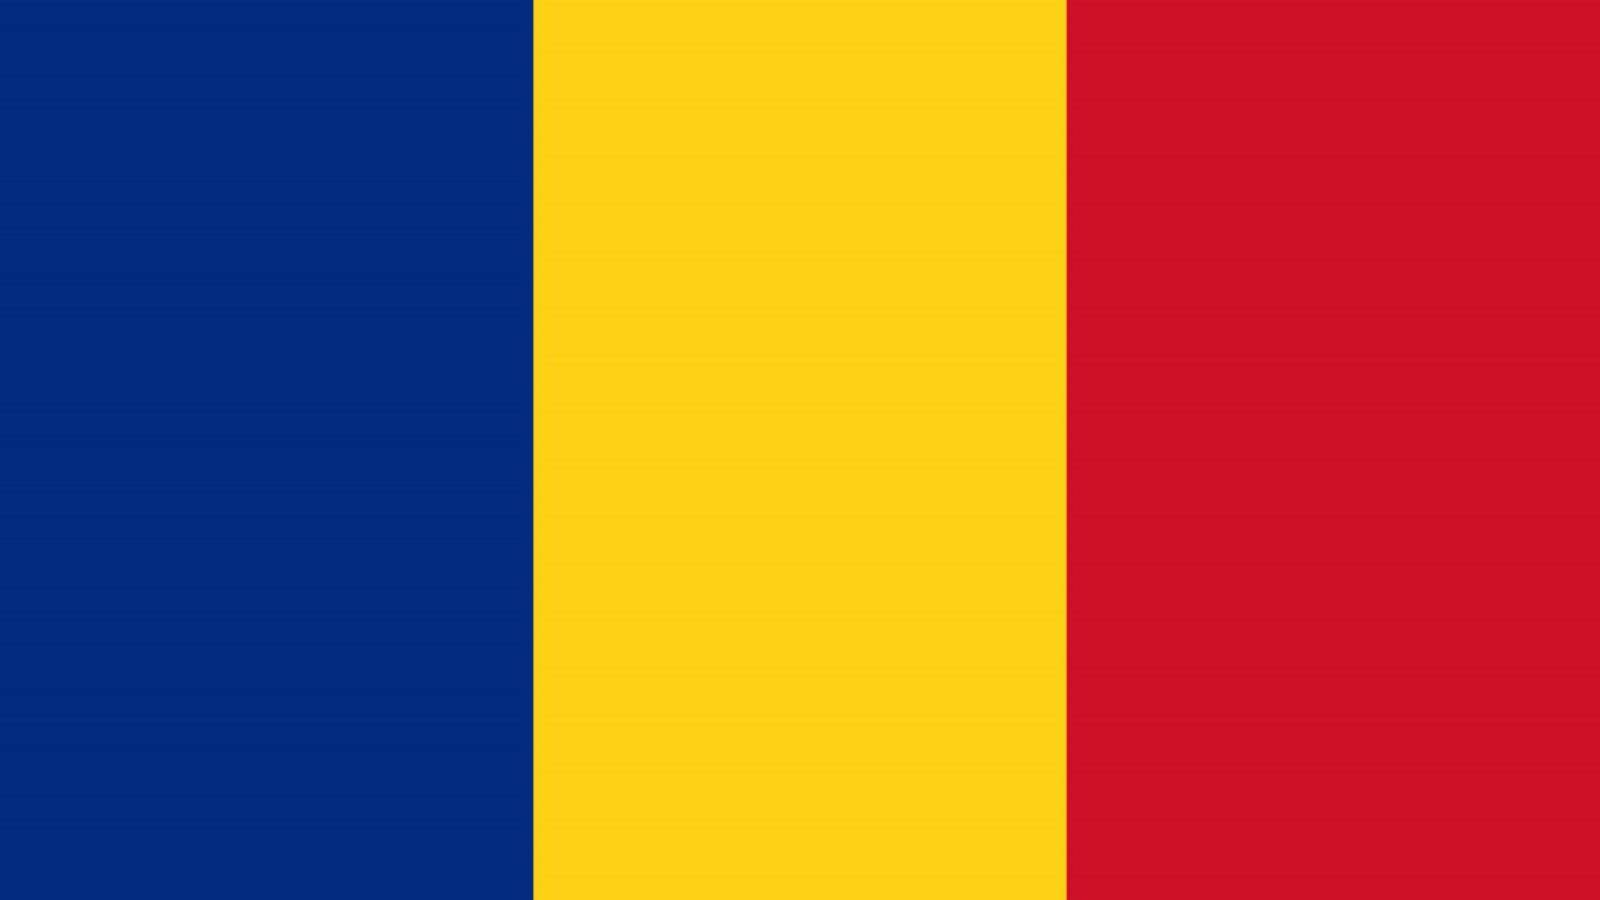 ANPC ALERTA Masti Protectie Neconforme Romania